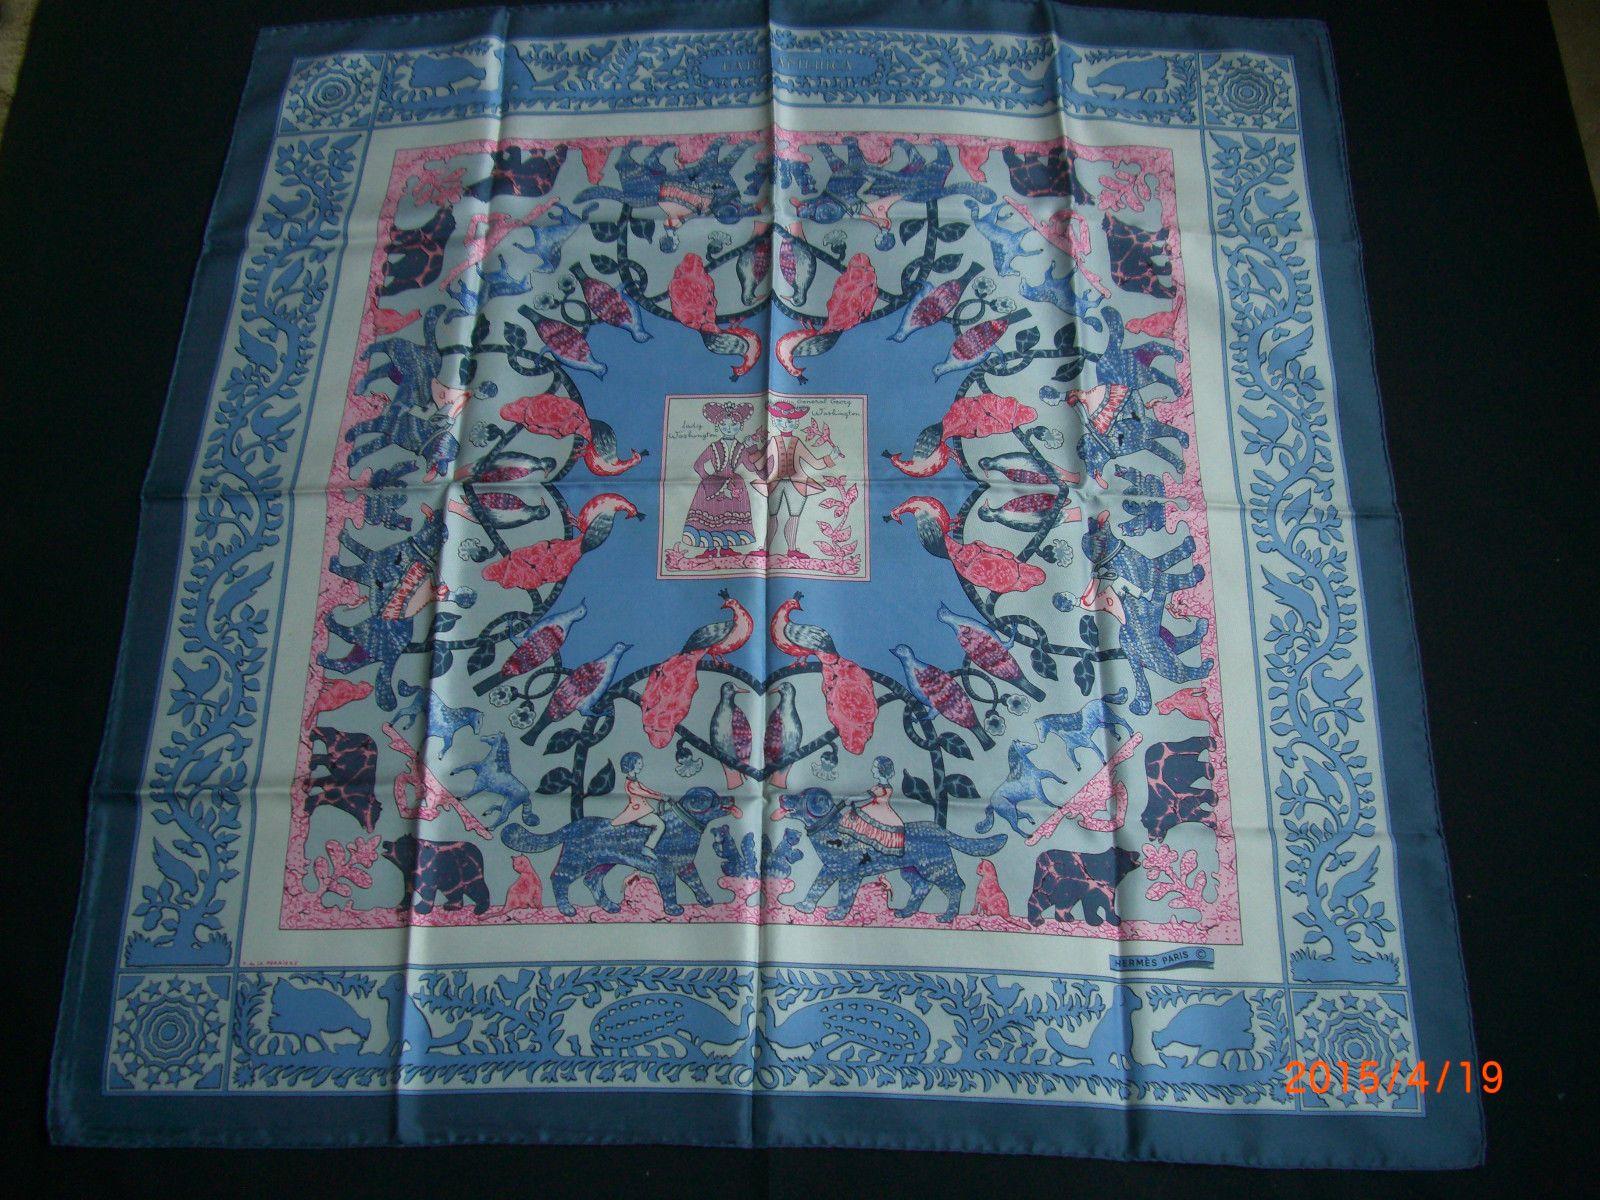 Rare Vintage Hermes Early America Silk Scarf | eBay ...